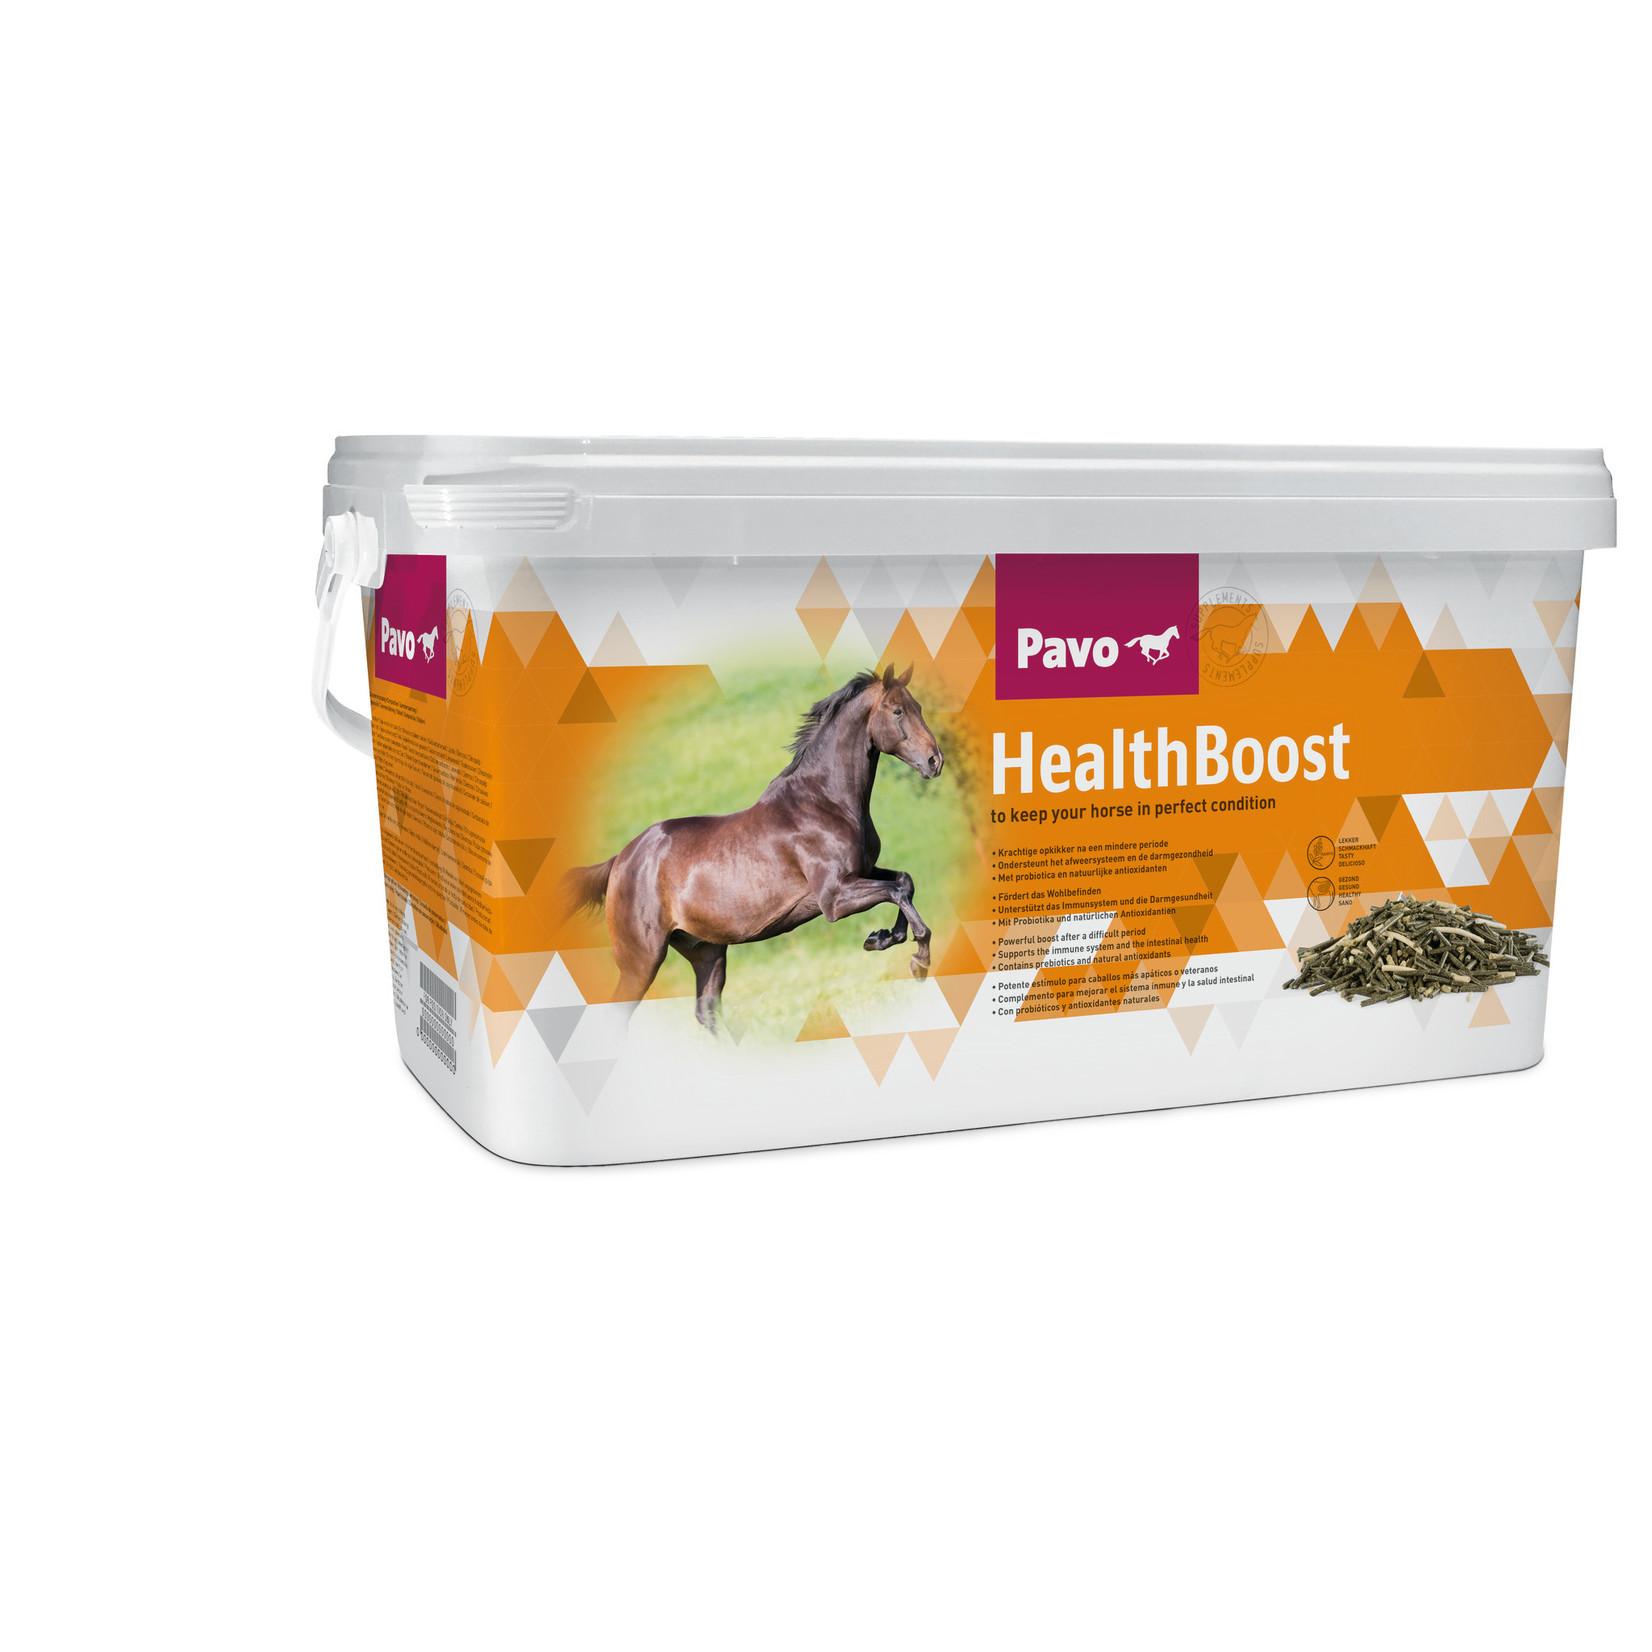 Pavo Pavo HealthBoost 8 KG